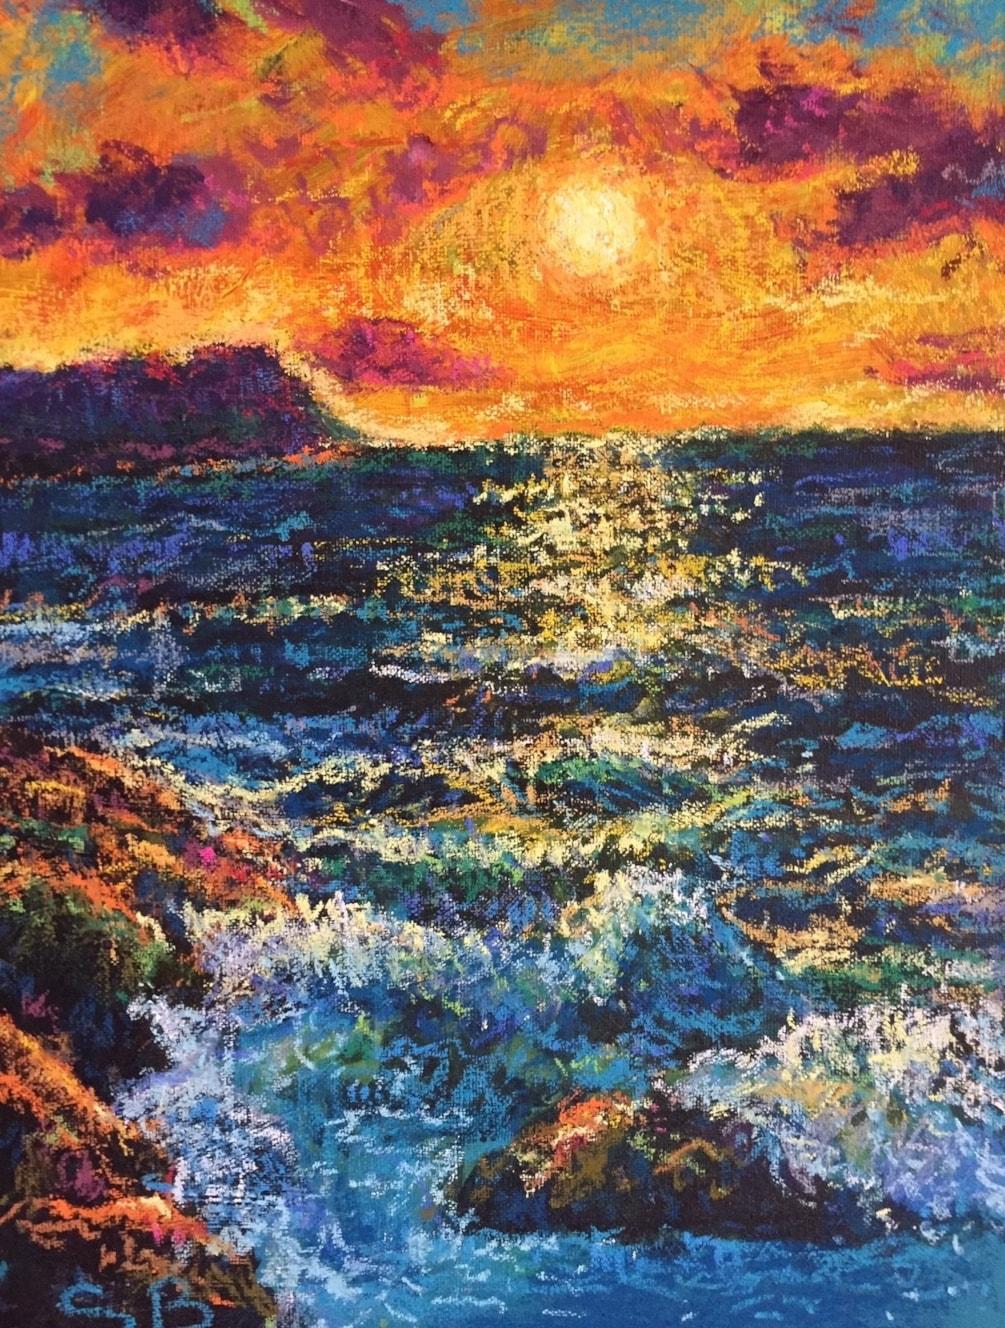 'Portland Dorset - Sunset - An Impression'